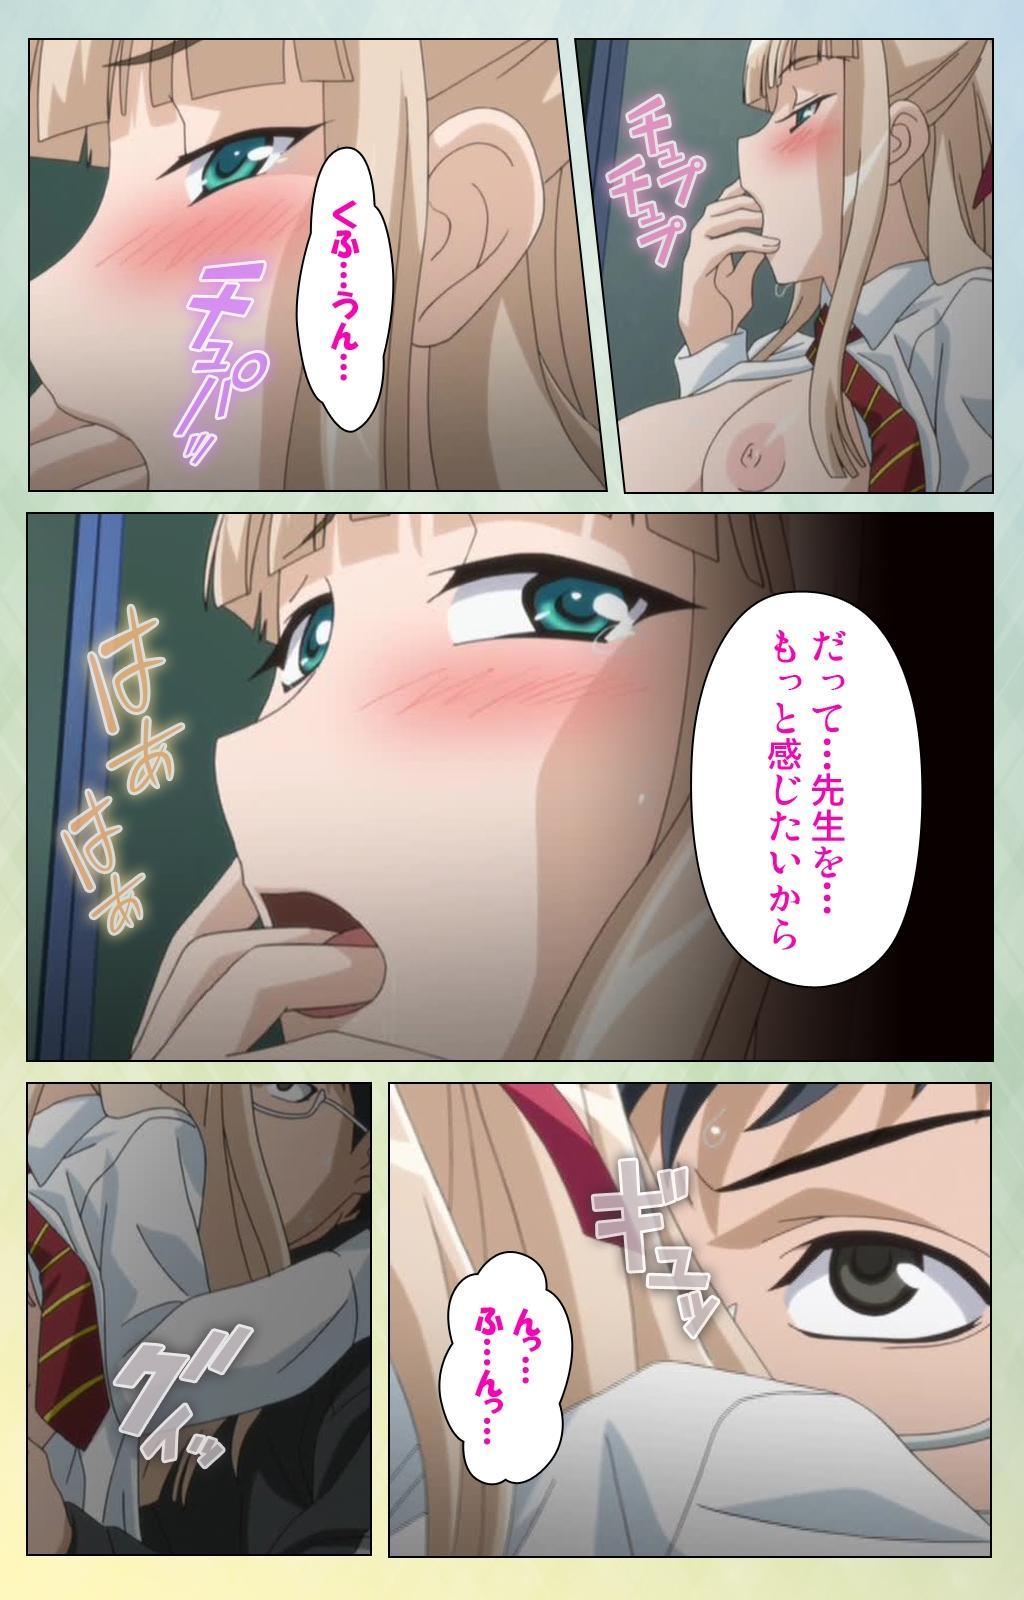 Furueru Kuchibiru fuzzy lips1 Complete Ban 5